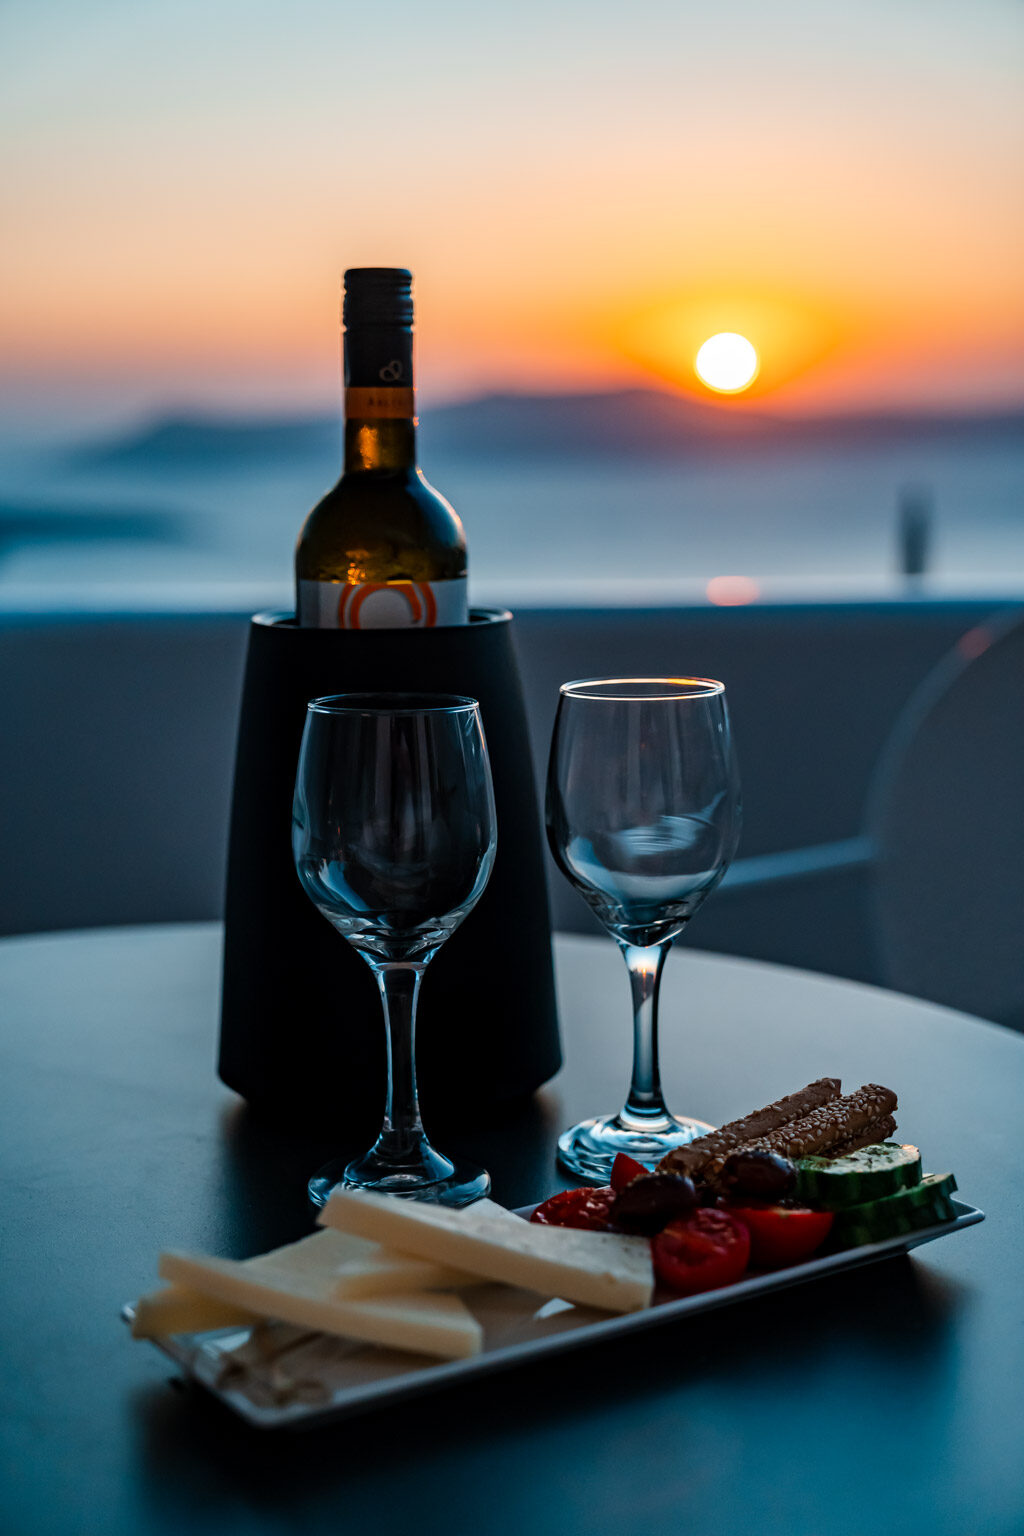 Romantic Sunset Fira Santorini Wine and Snacks